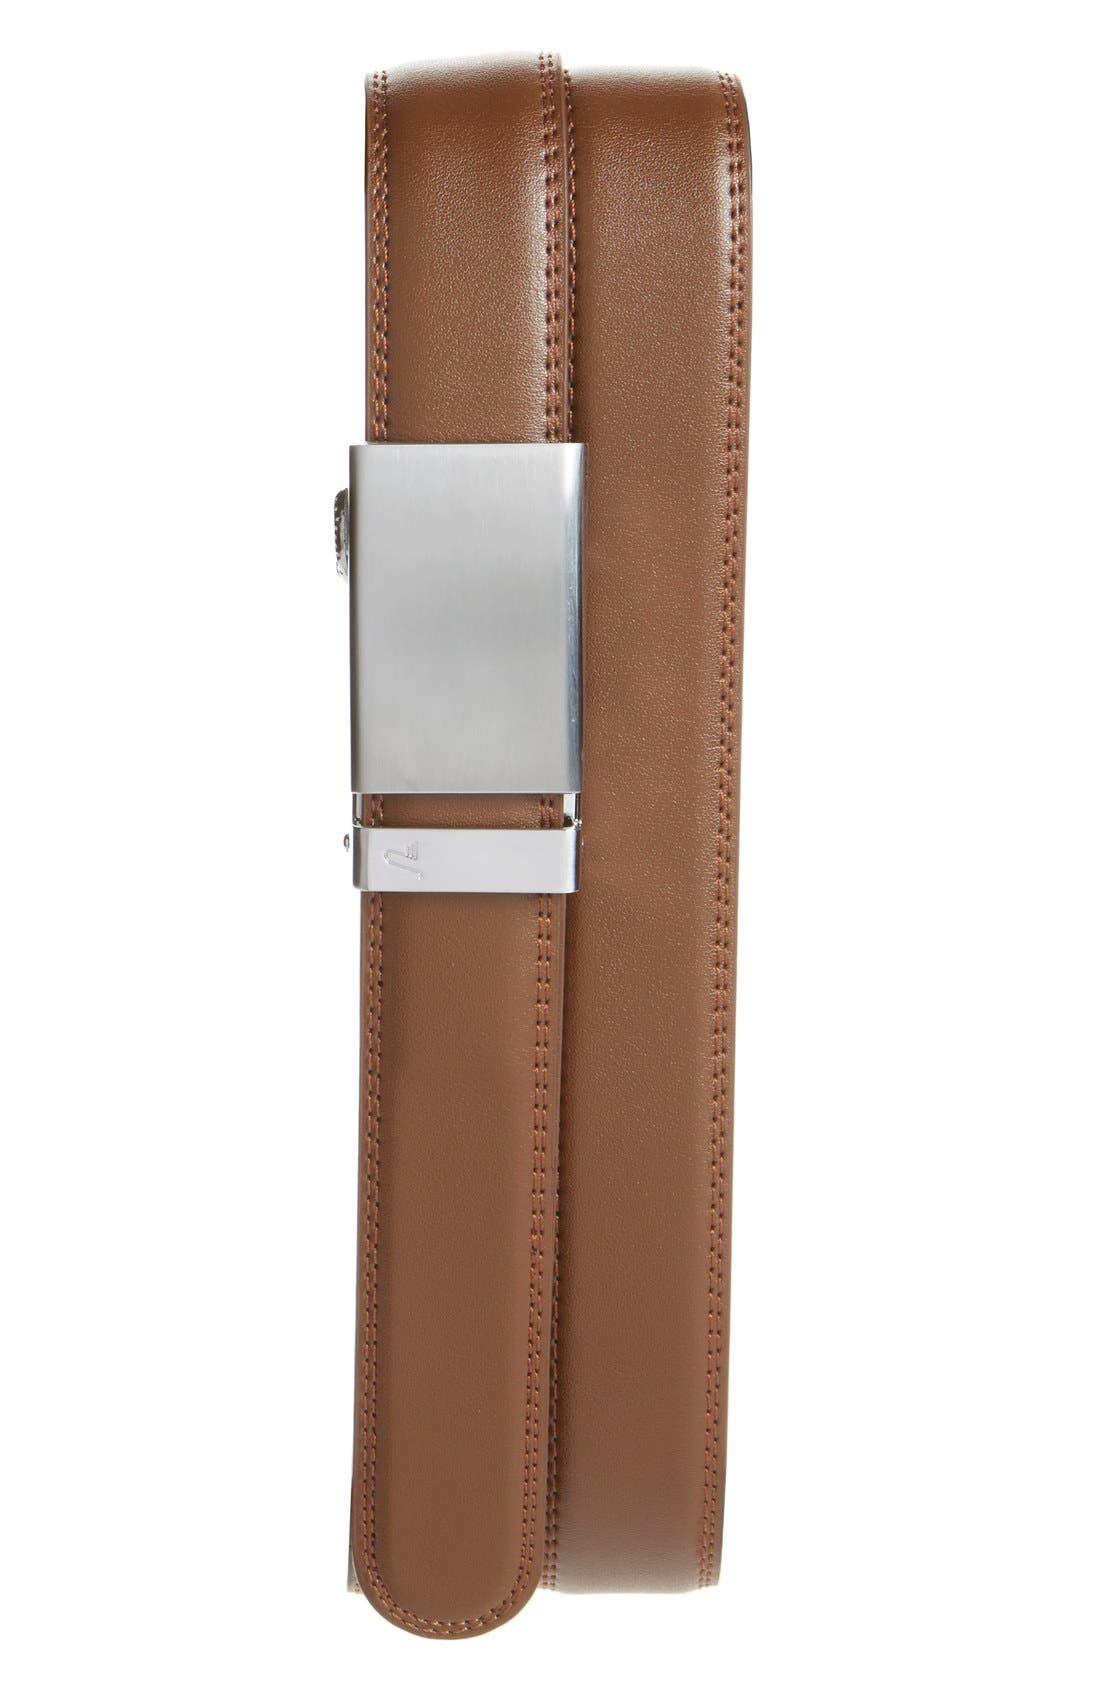 Main Image - Mission Belt 'Cocoa' Leather Belt